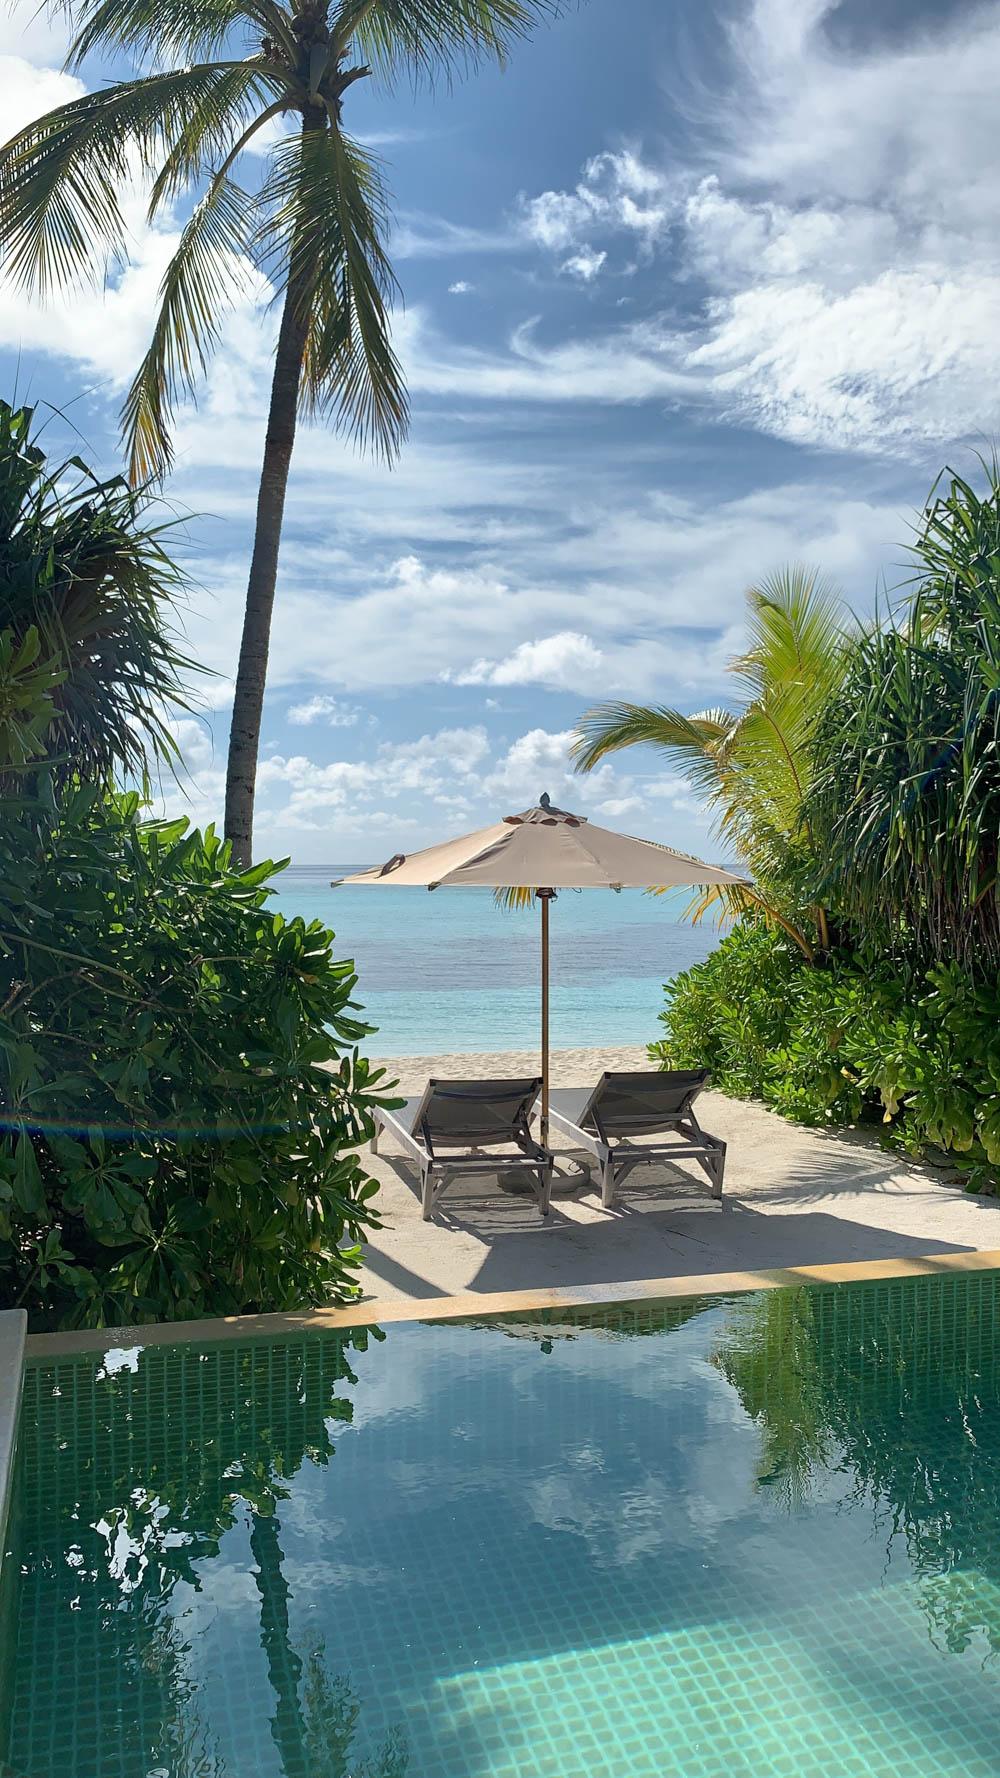 Maldives_Resort_Honeymoon_Hurawalhi_MaldivesTravelAdvisor-36.jpg